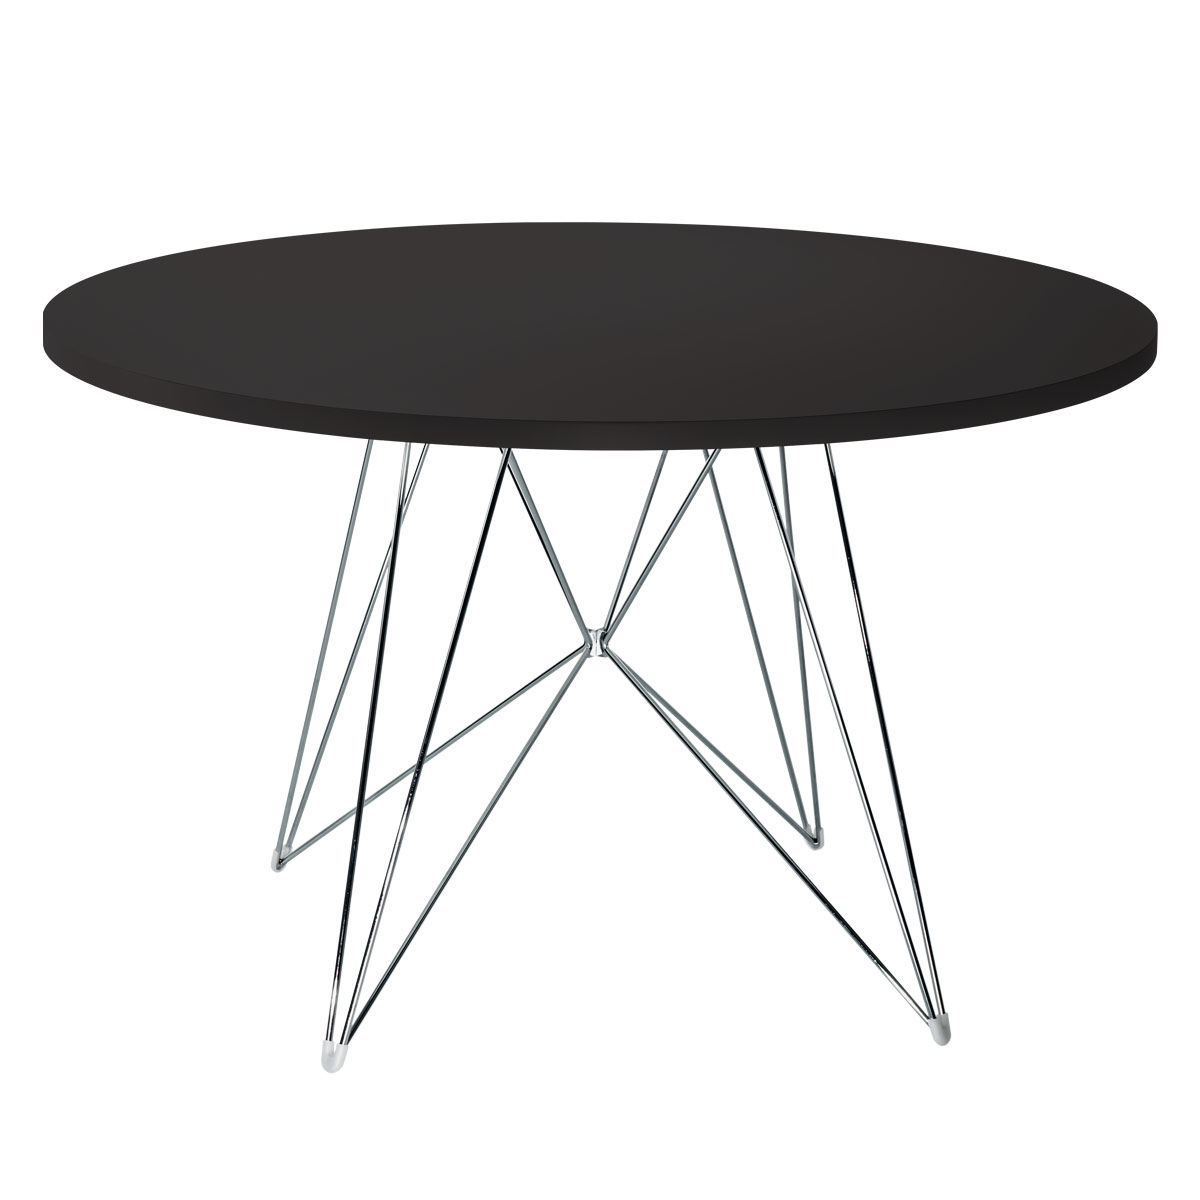 black and chrome furniture. Magis Tavolo XZ3 Round Table - Chrome, White, Black, Copper, Black And Chrome Furniture